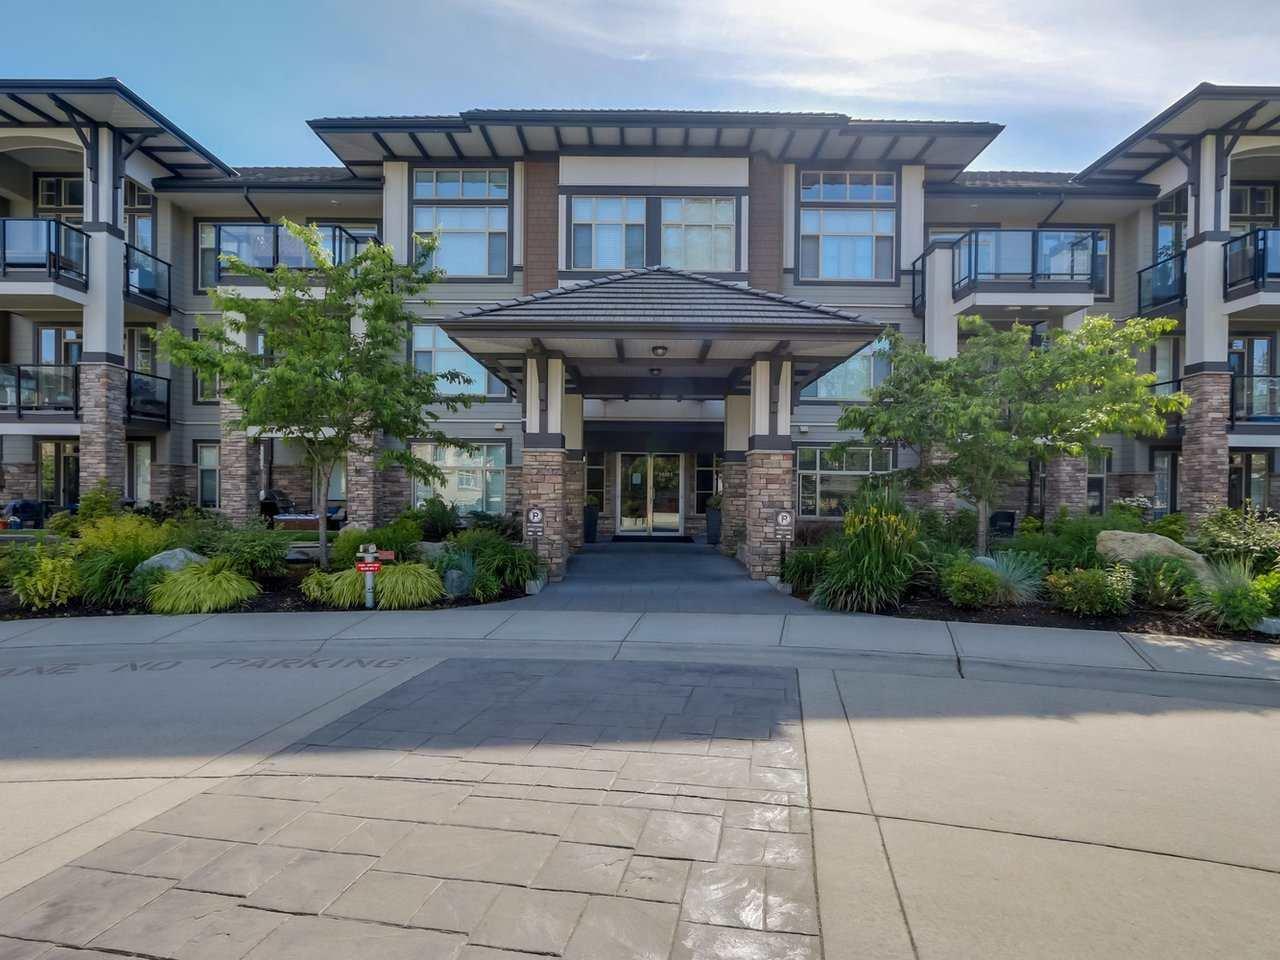 "Main Photo: 206 15185 36 Avenue in Surrey: Morgan Creek Condo for sale in ""EDGEWATER"" (South Surrey White Rock)  : MLS®# R2184049"